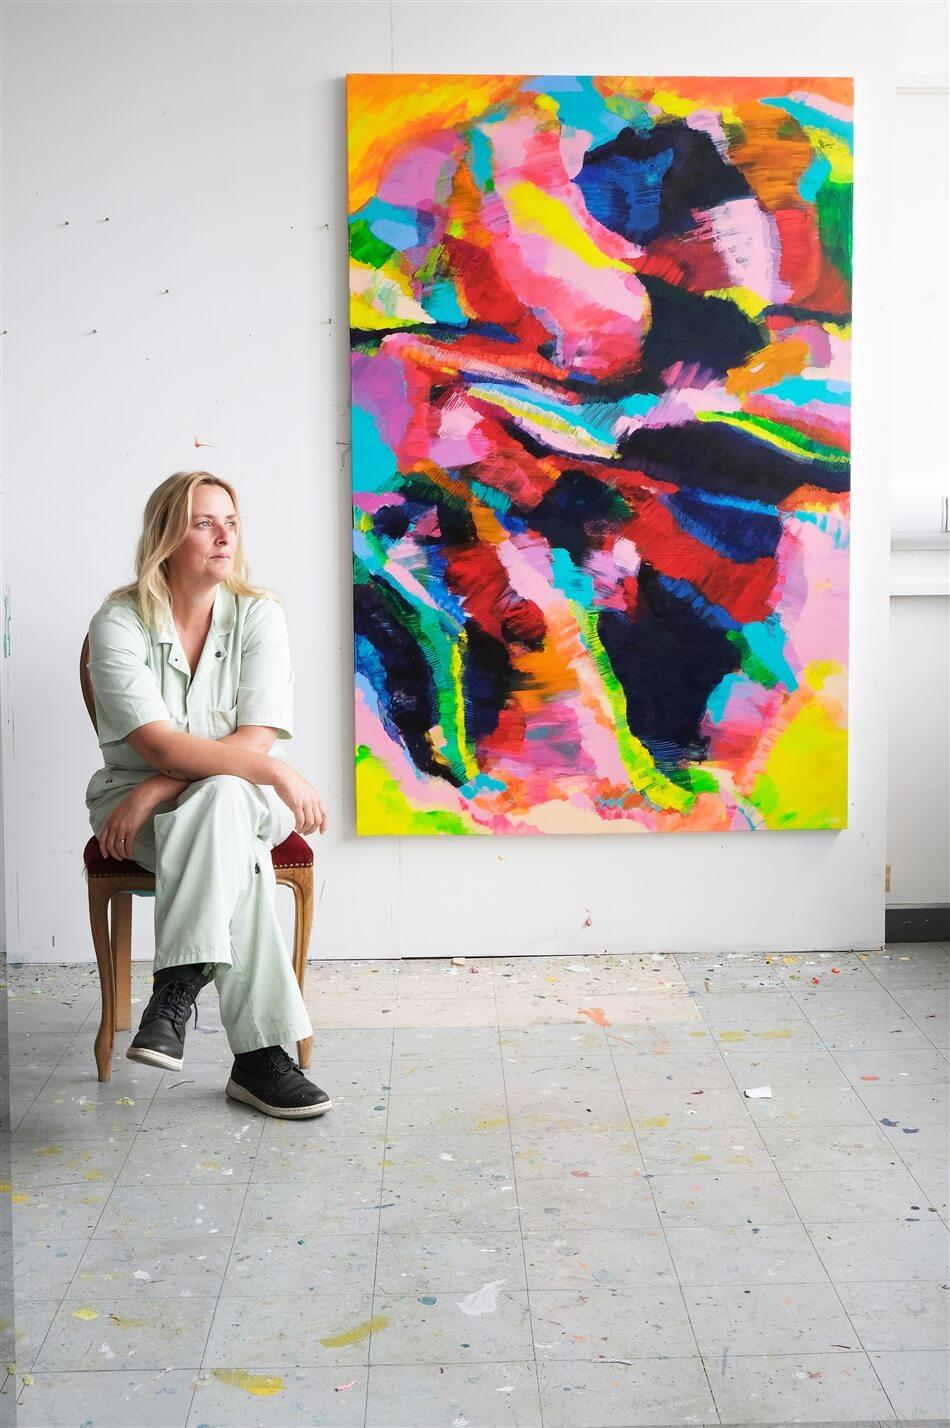 Esther O'Kelly